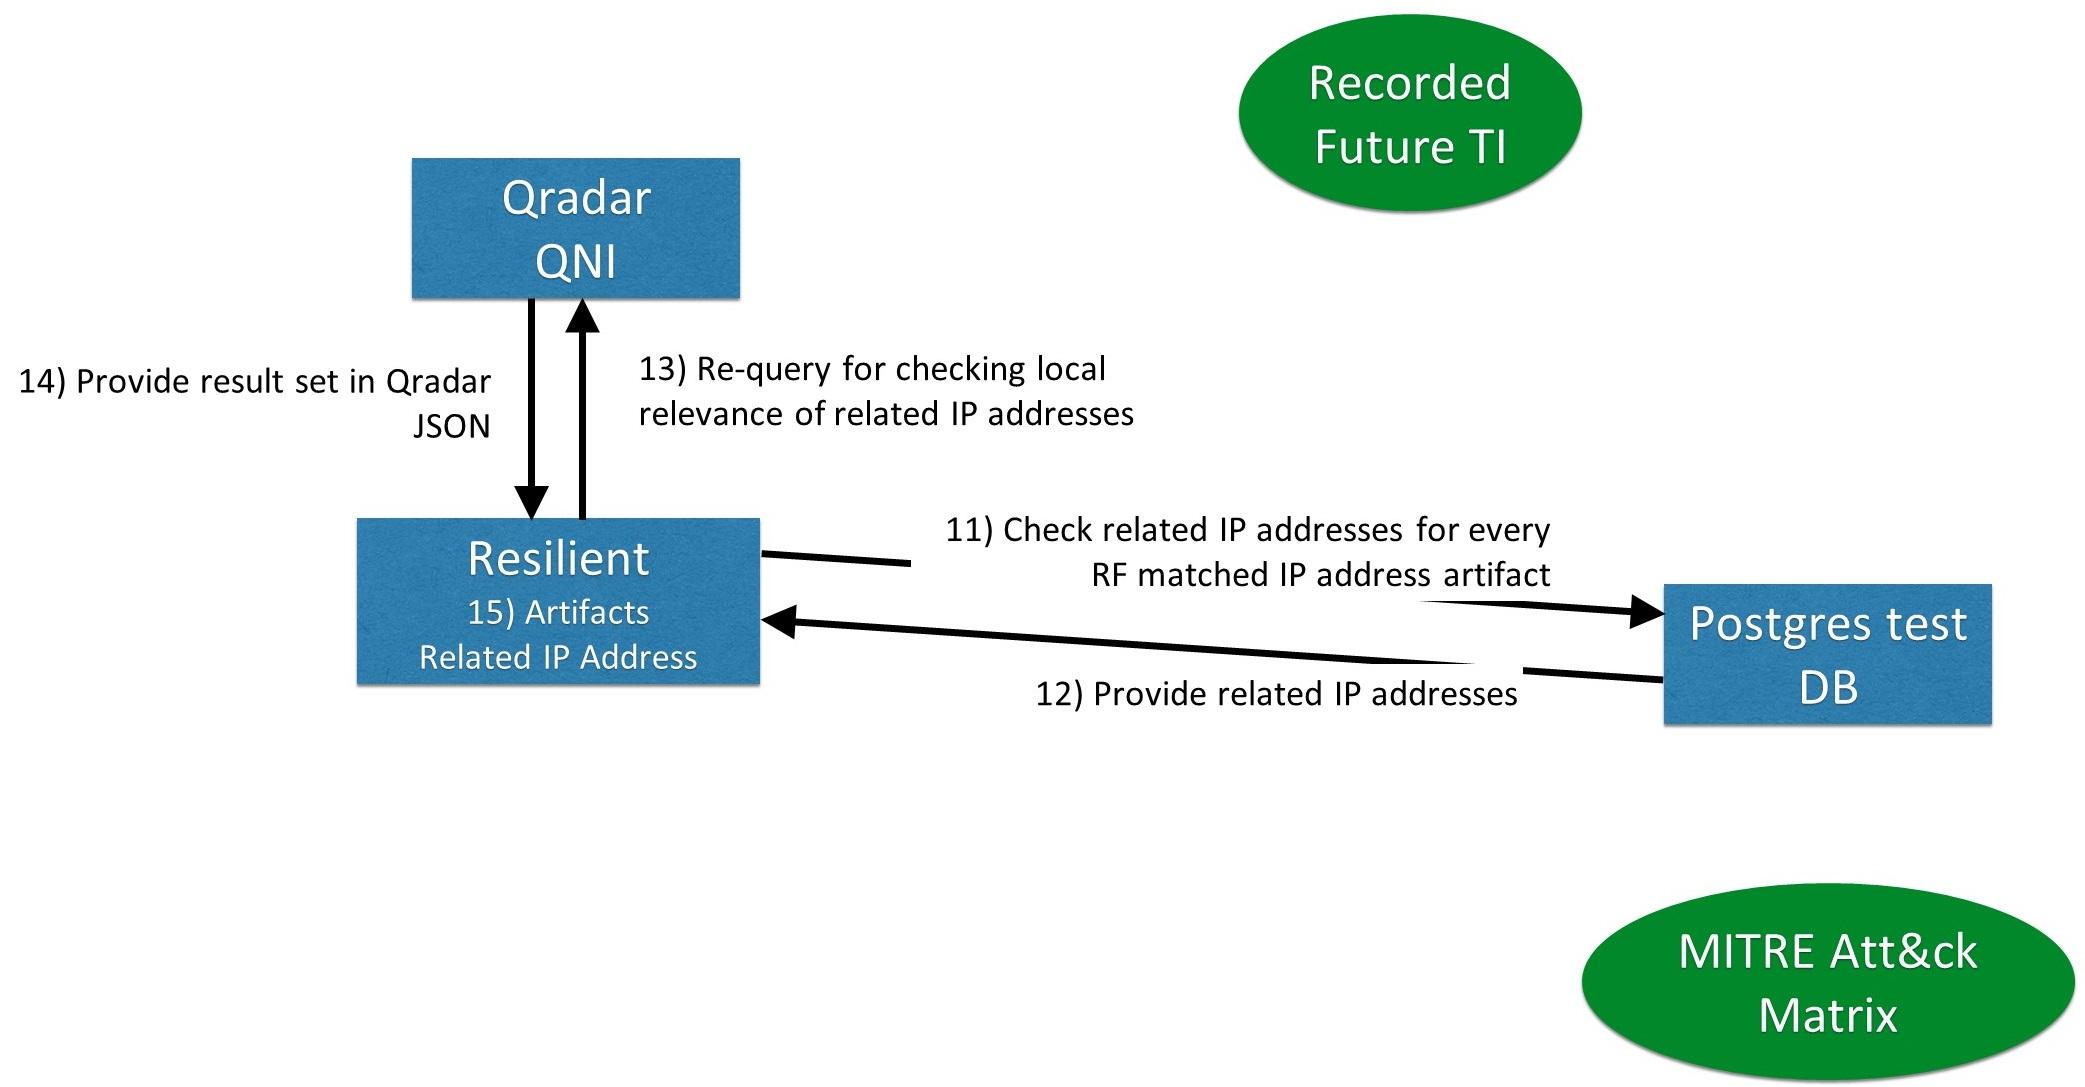 Implementation – Related IP Addresses – steps 11-15